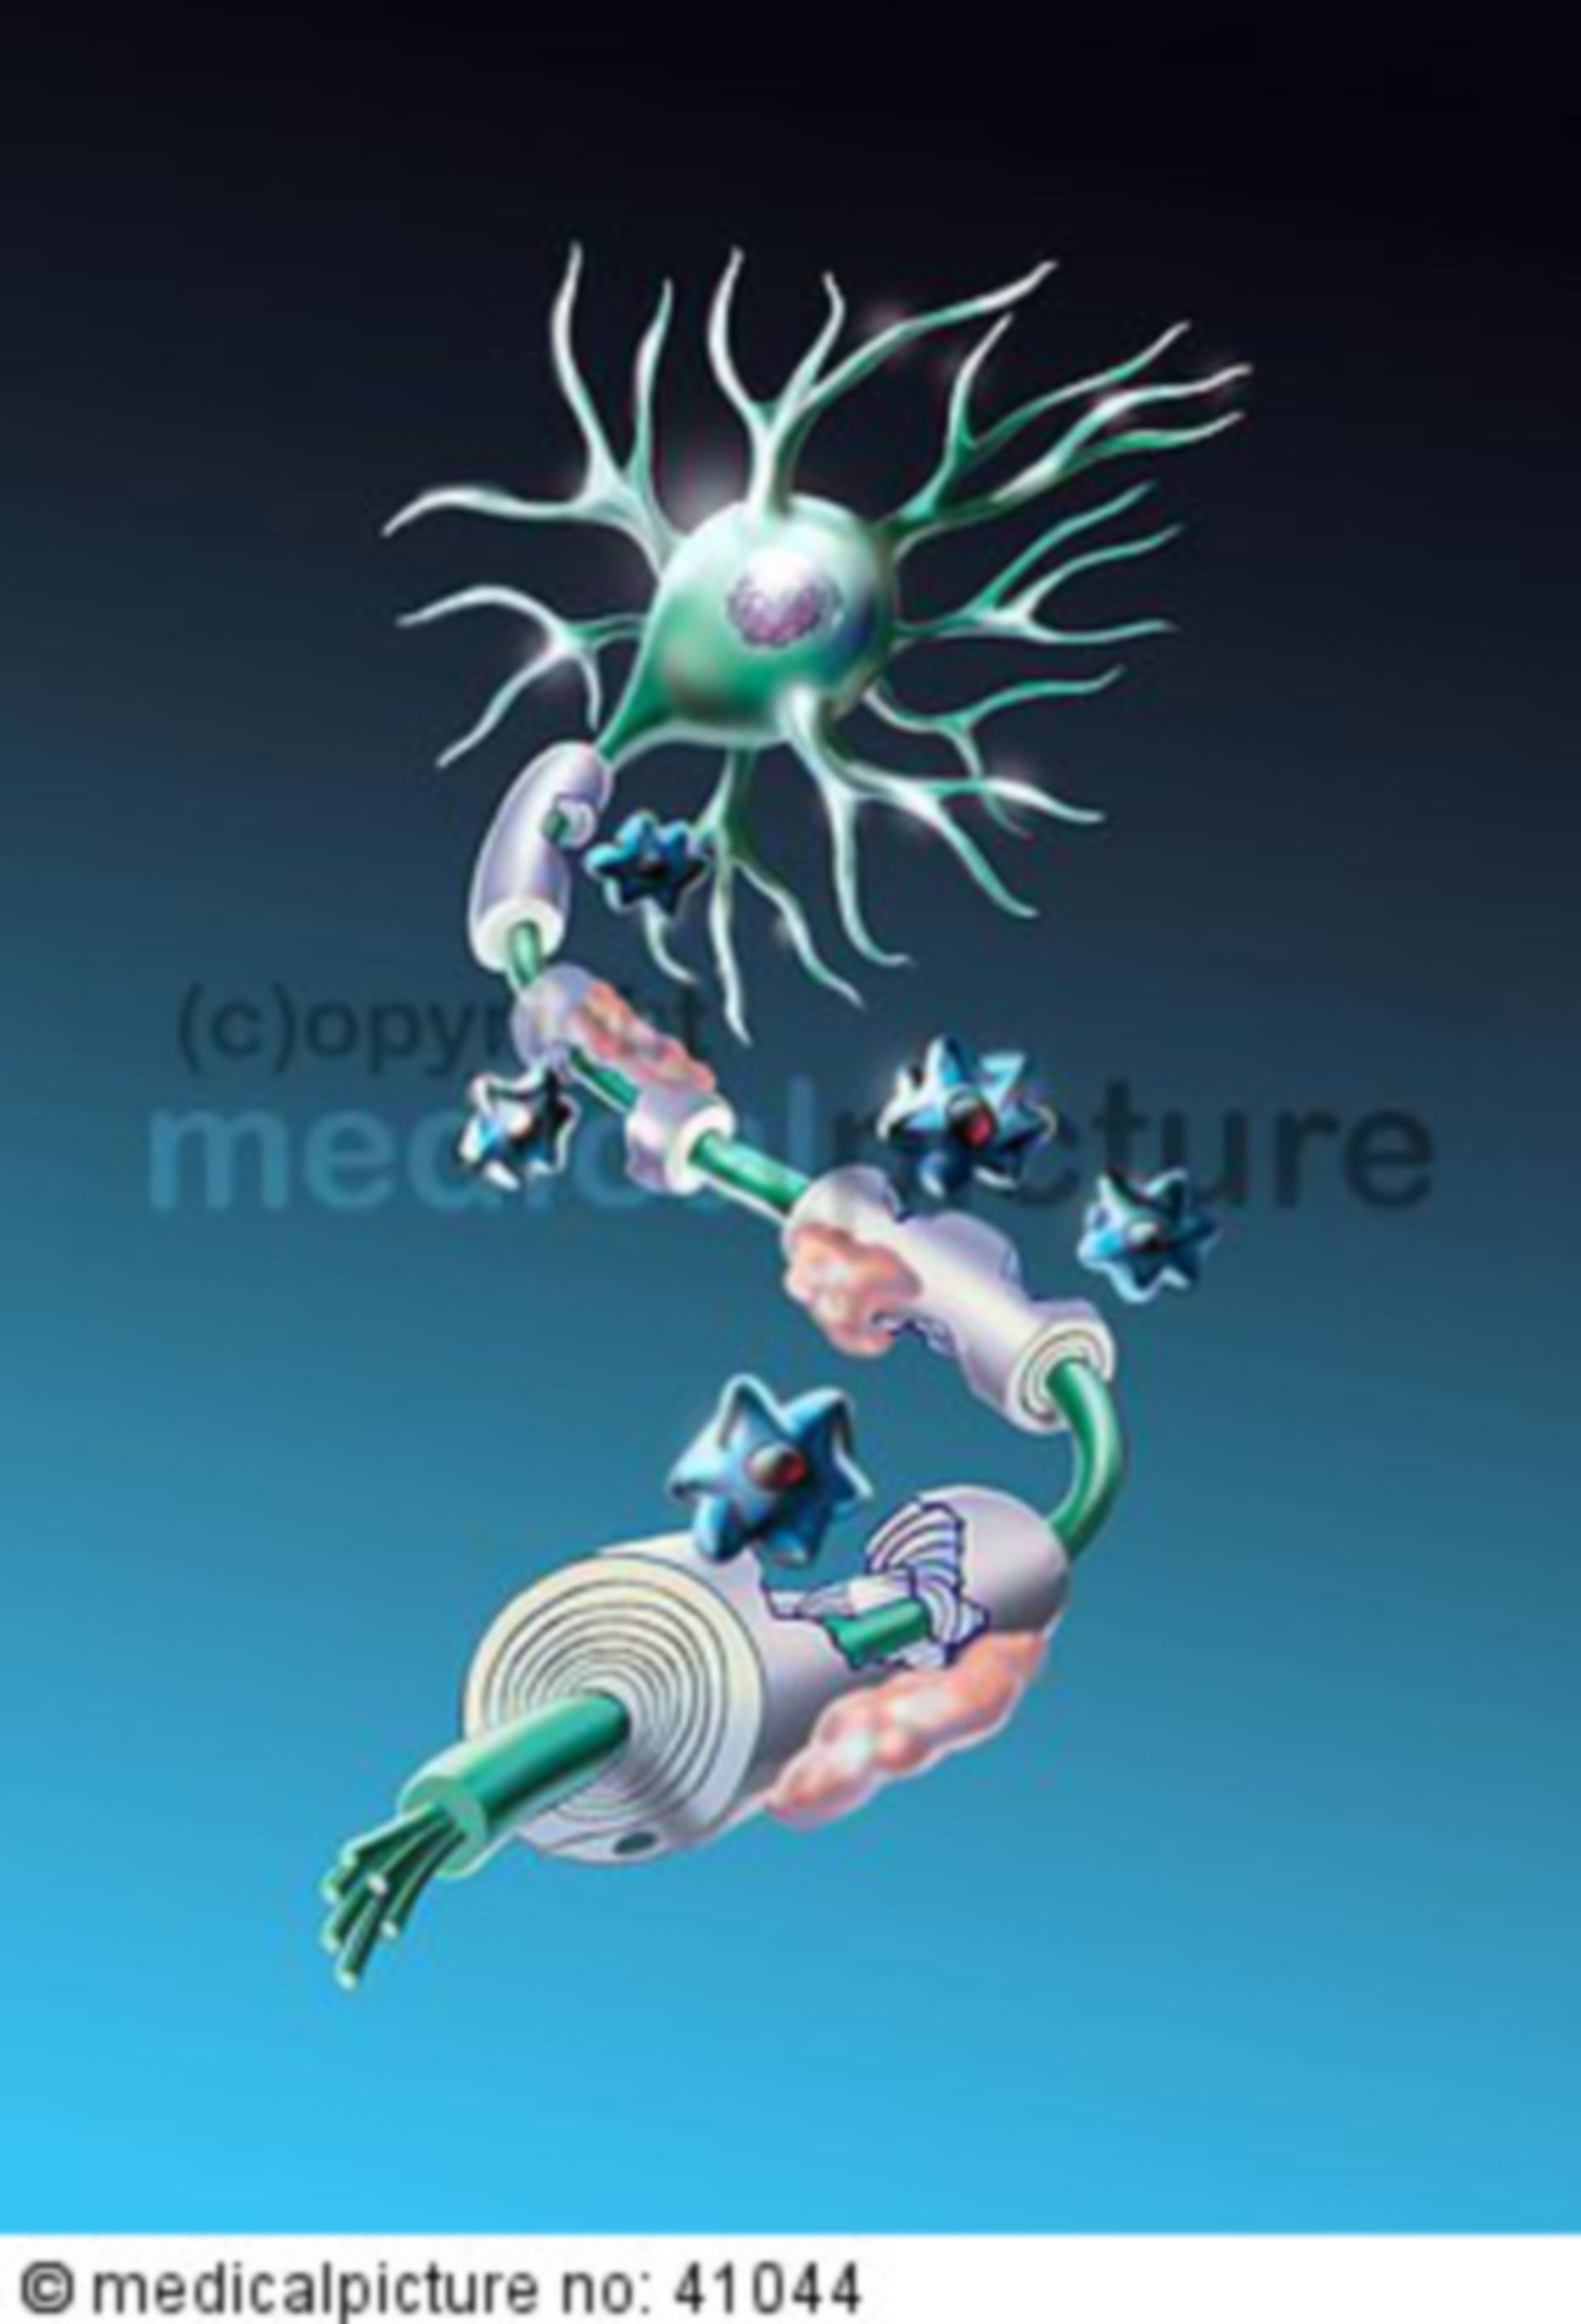 Damage of myelin sheaths due to multiple sclerosis (MS)